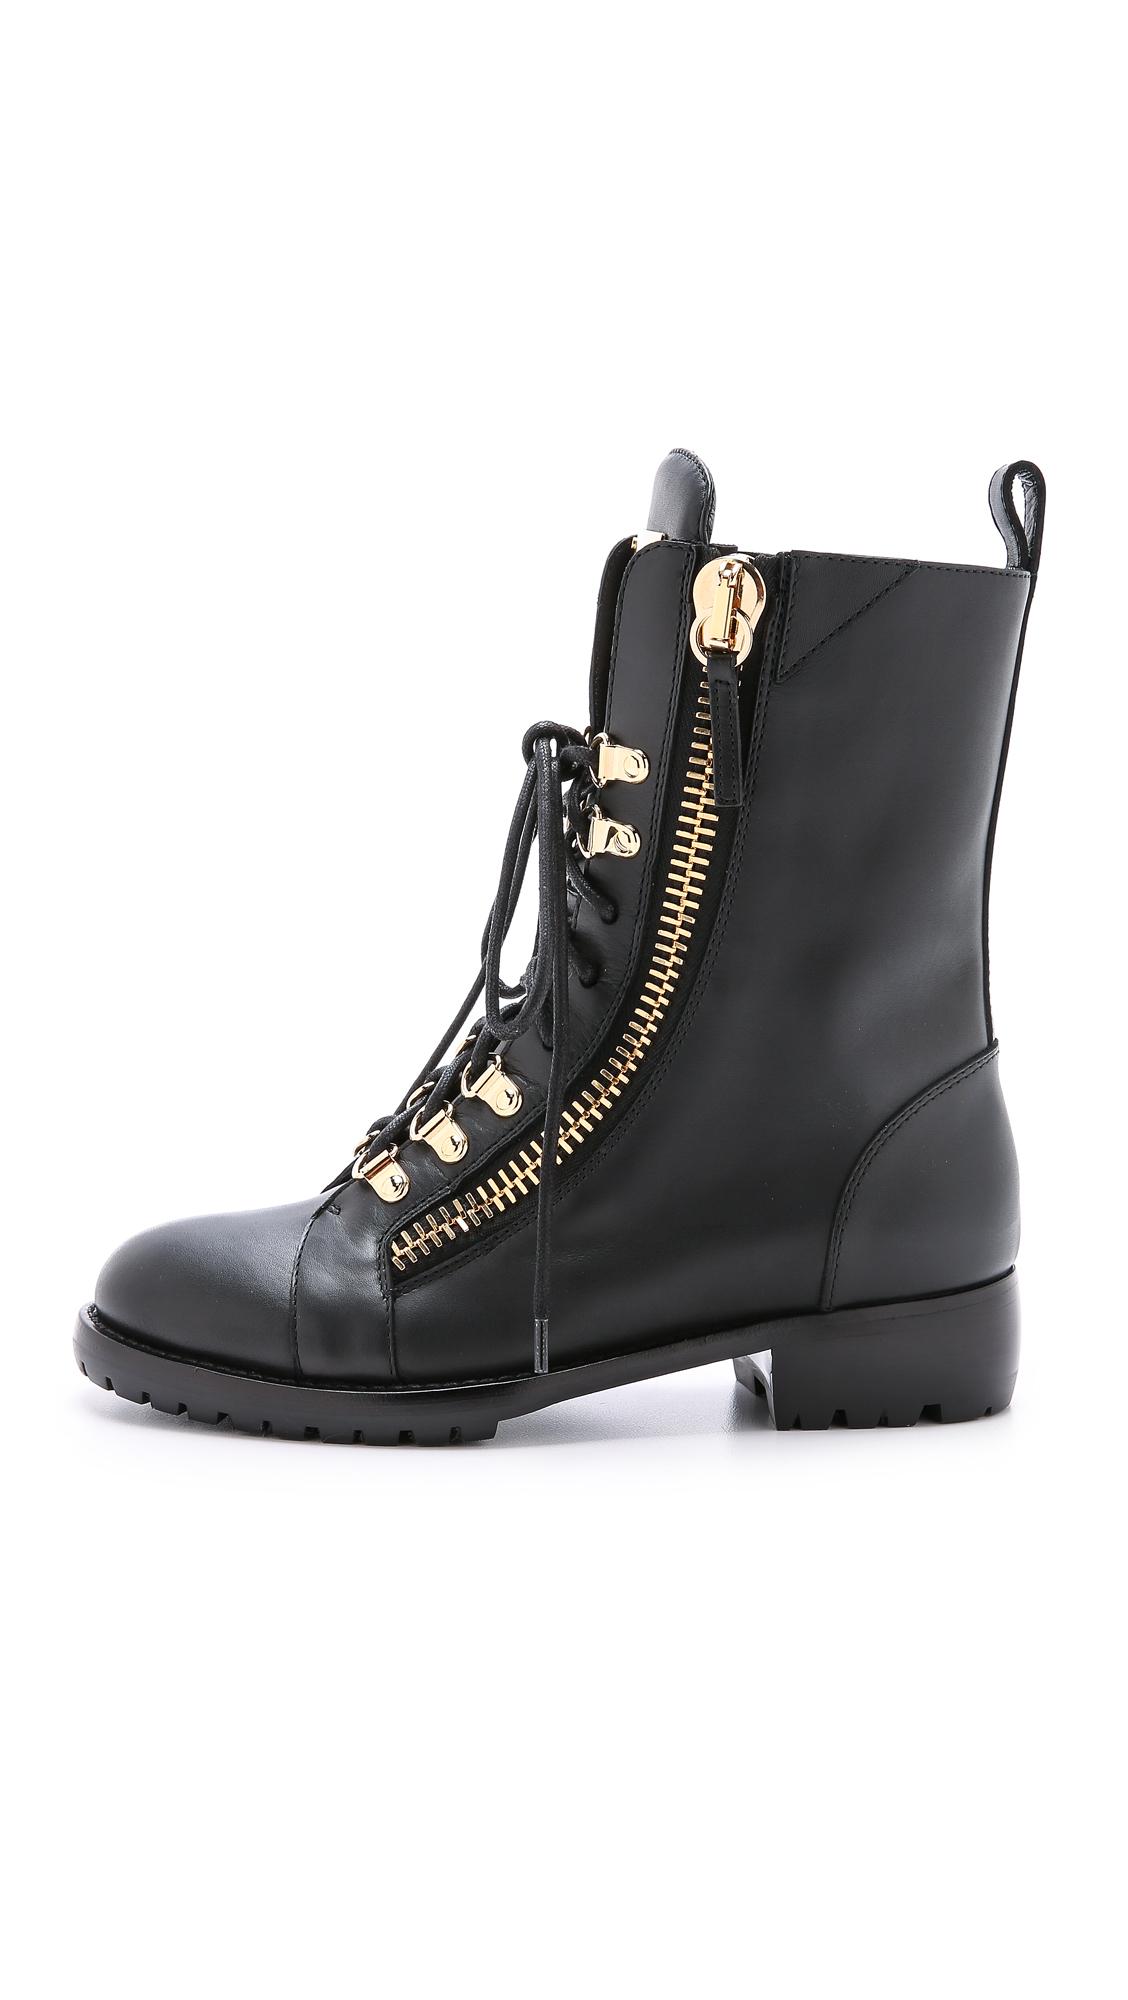 Giuseppe zanotti Zipper Combat Boots - Black in Black | Lyst